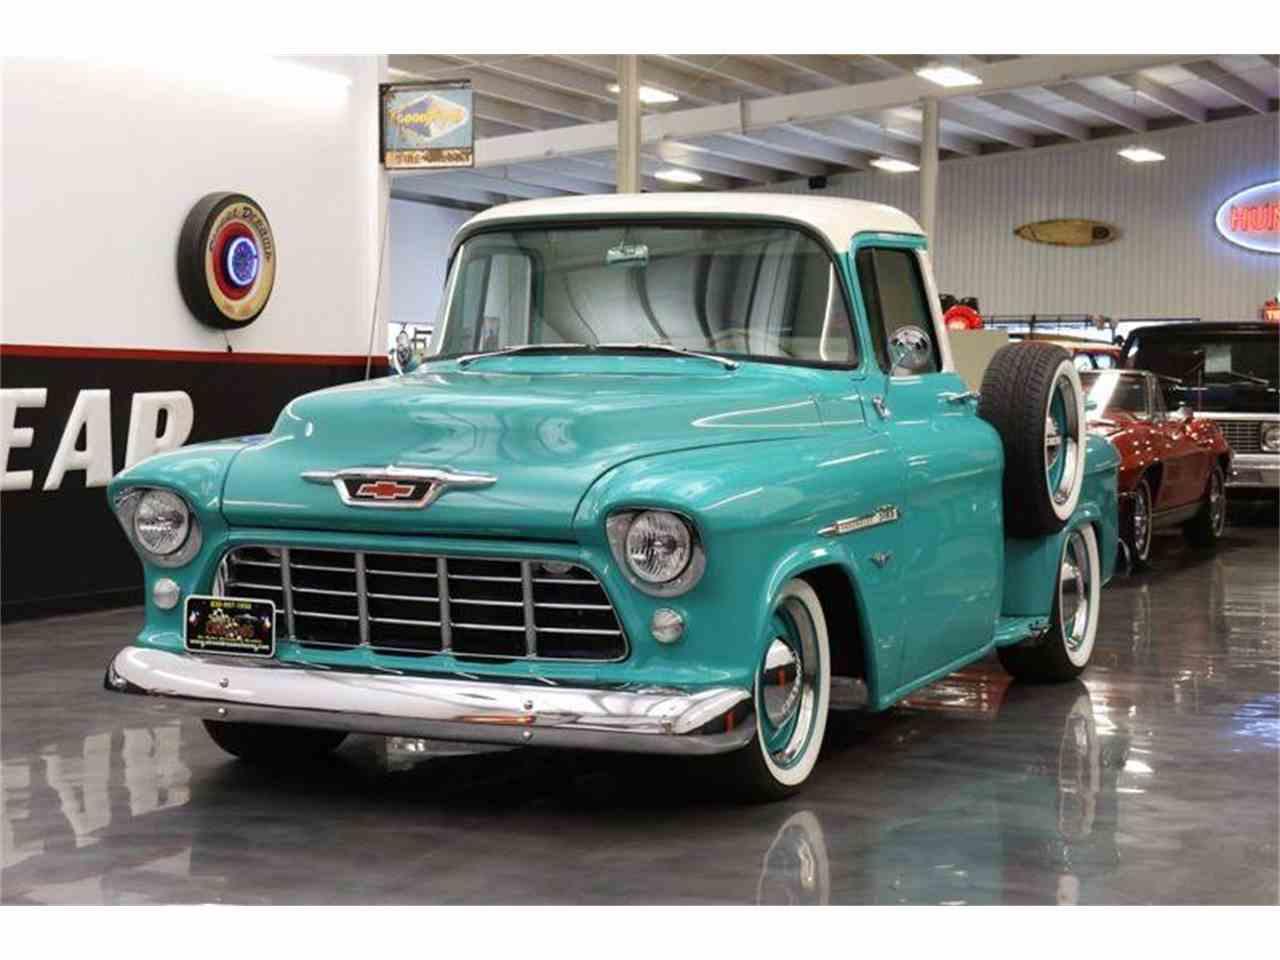 All Chevy 1955 chevrolet 3100 : 1955 Chevrolet 3100 for Sale | ClassicCars.com | CC-963002